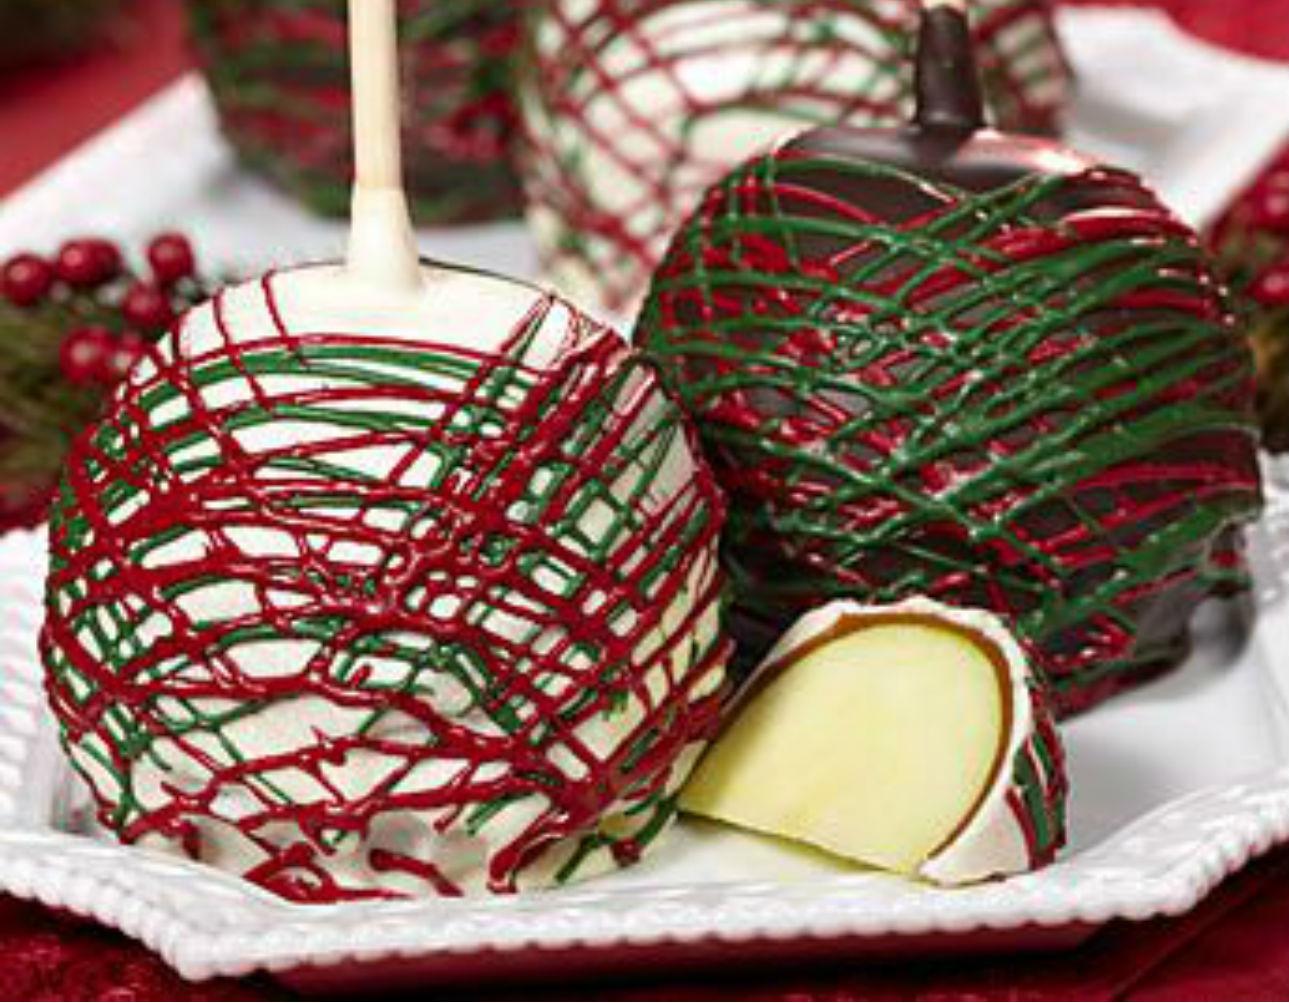 Receta de como hacer manzanas cubiertas de chocolate for Paletas de cocina decoradas